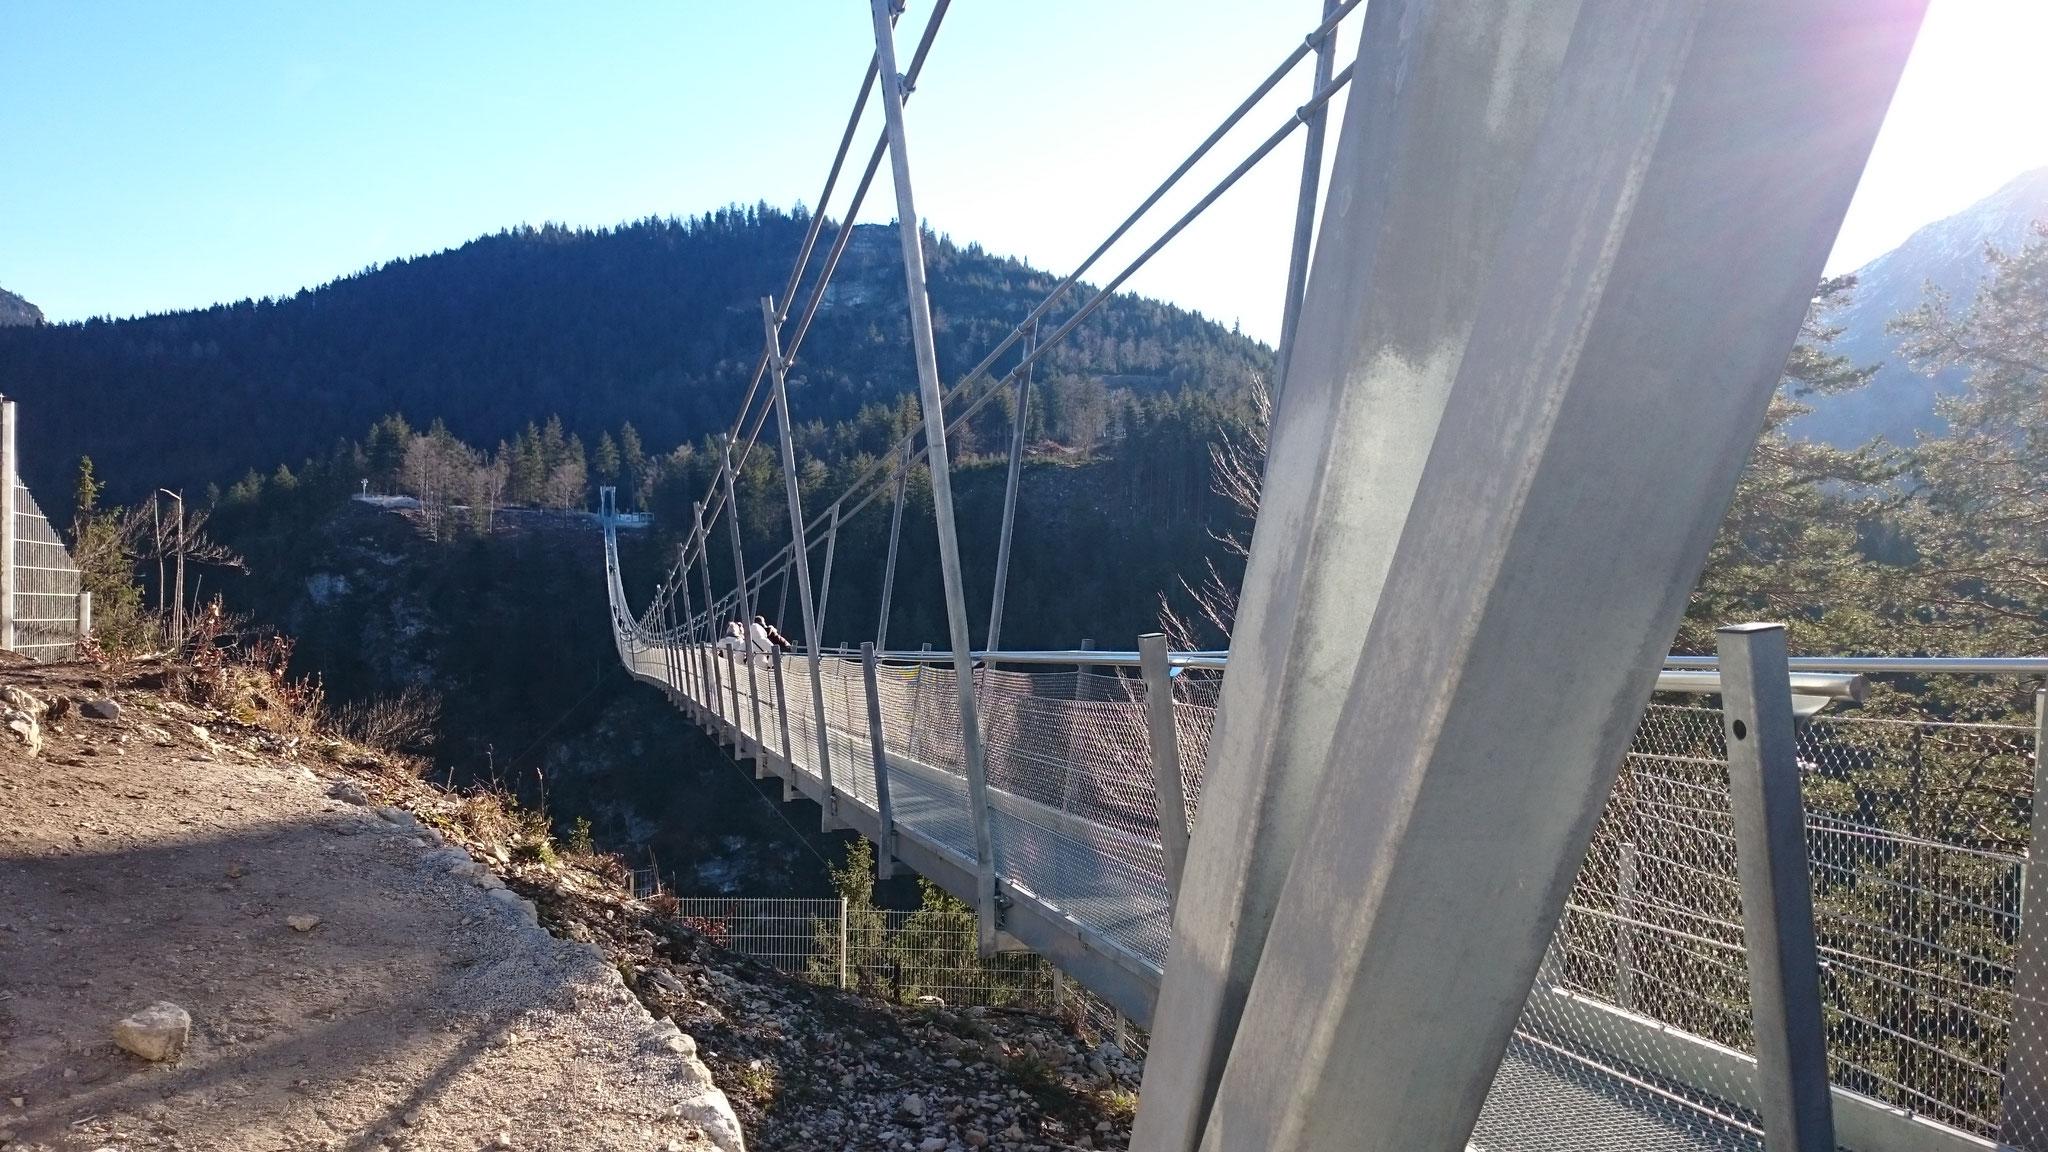 Fußgänger-Hängebrücke 'Highline 179' bei Reutte (Tirol)